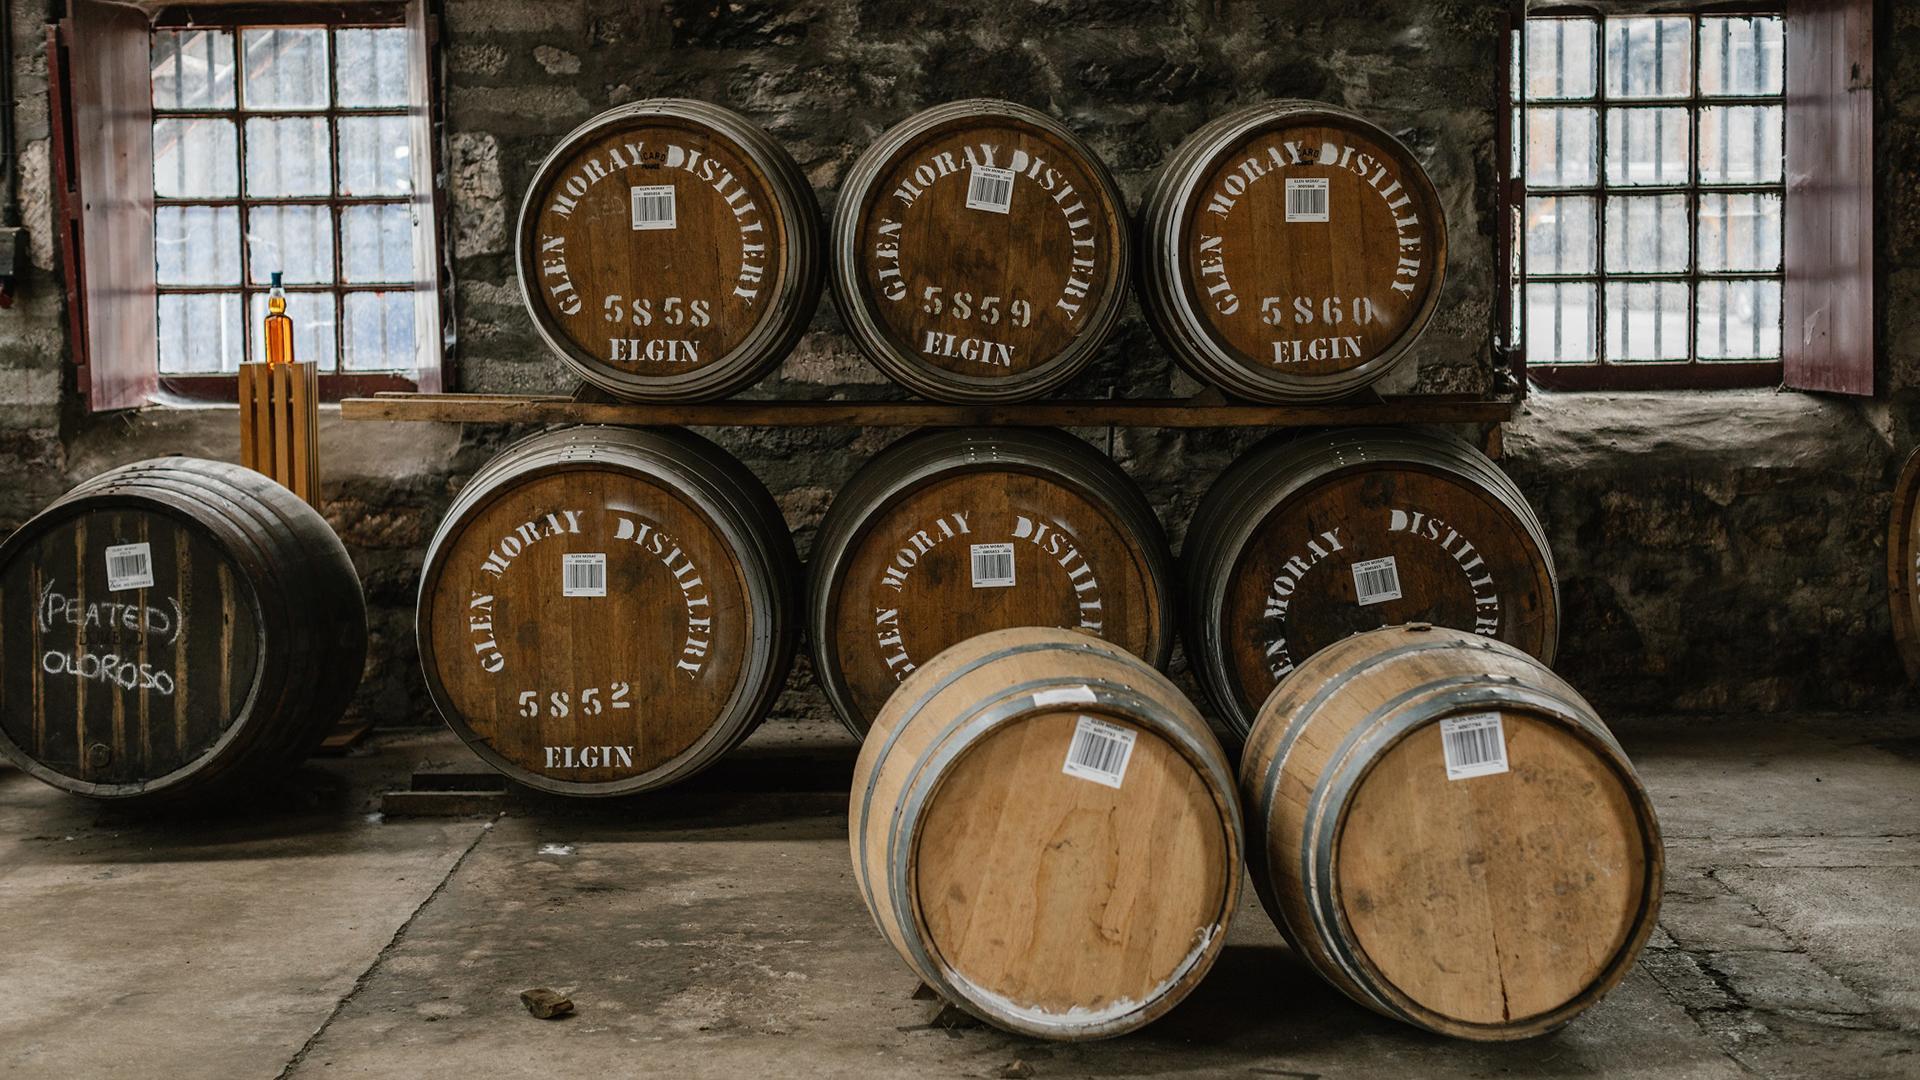 Glen Moray whisky barrels